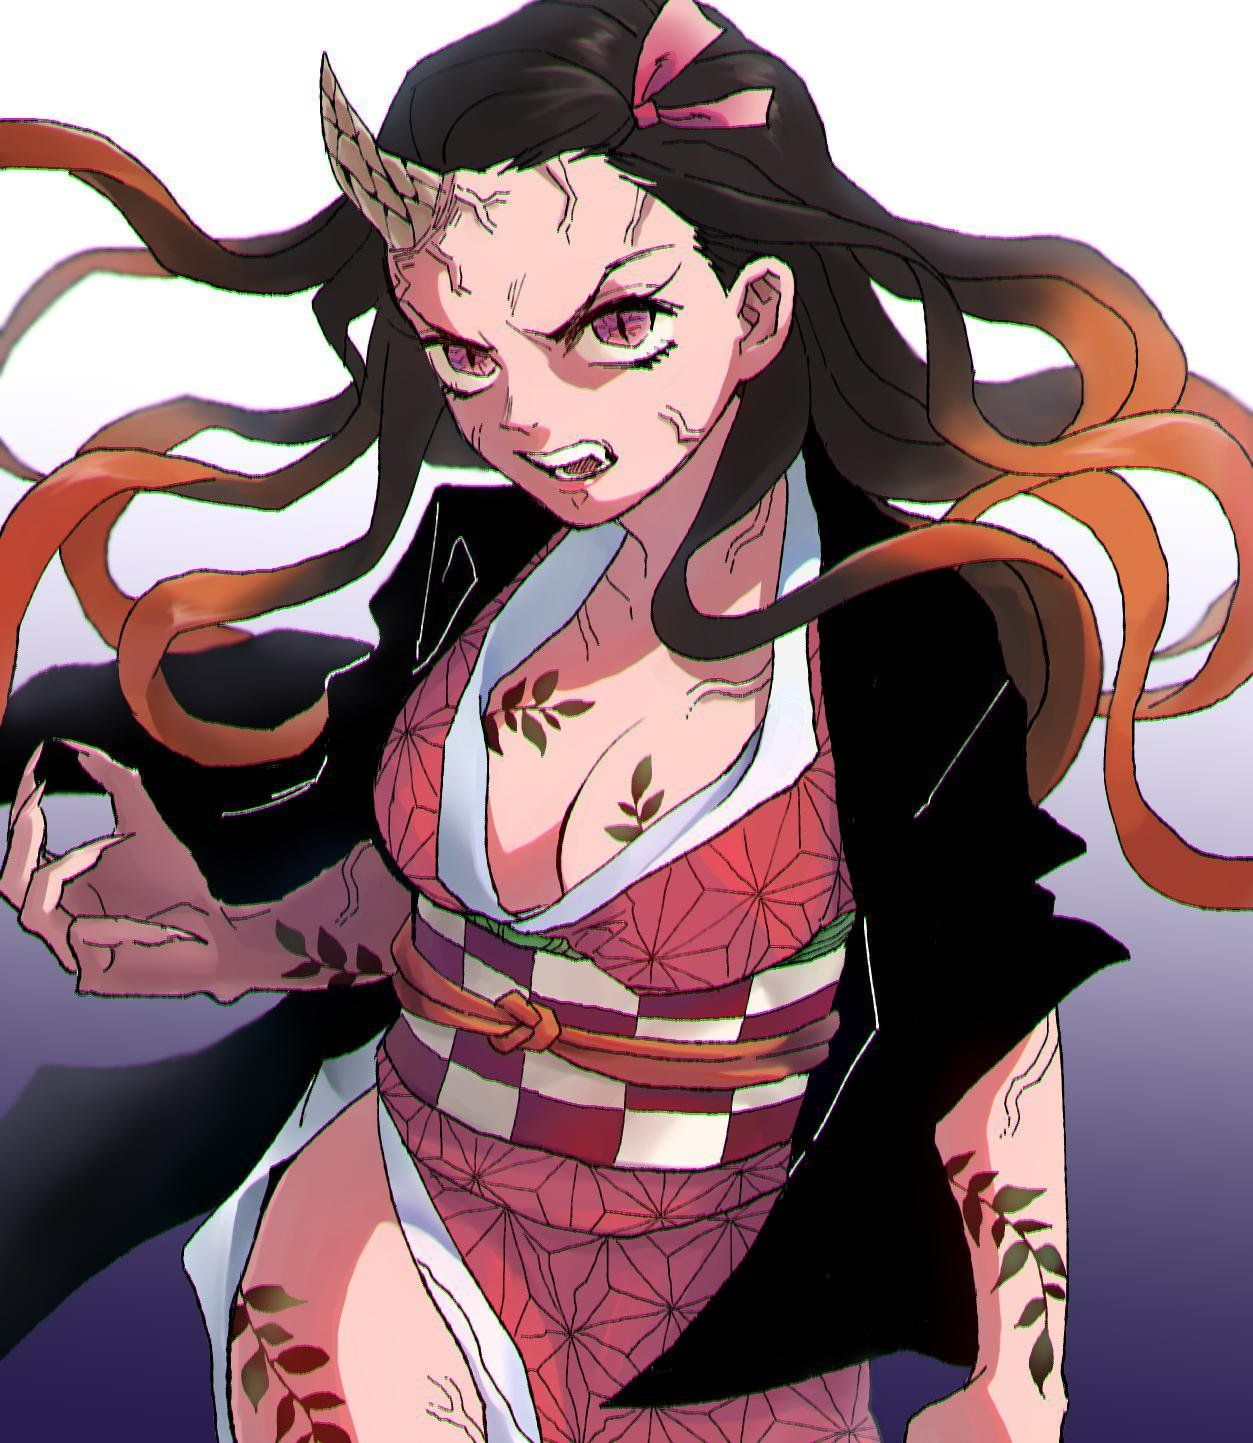 Demon Slayer Anime demon, Slayer anime, Demon